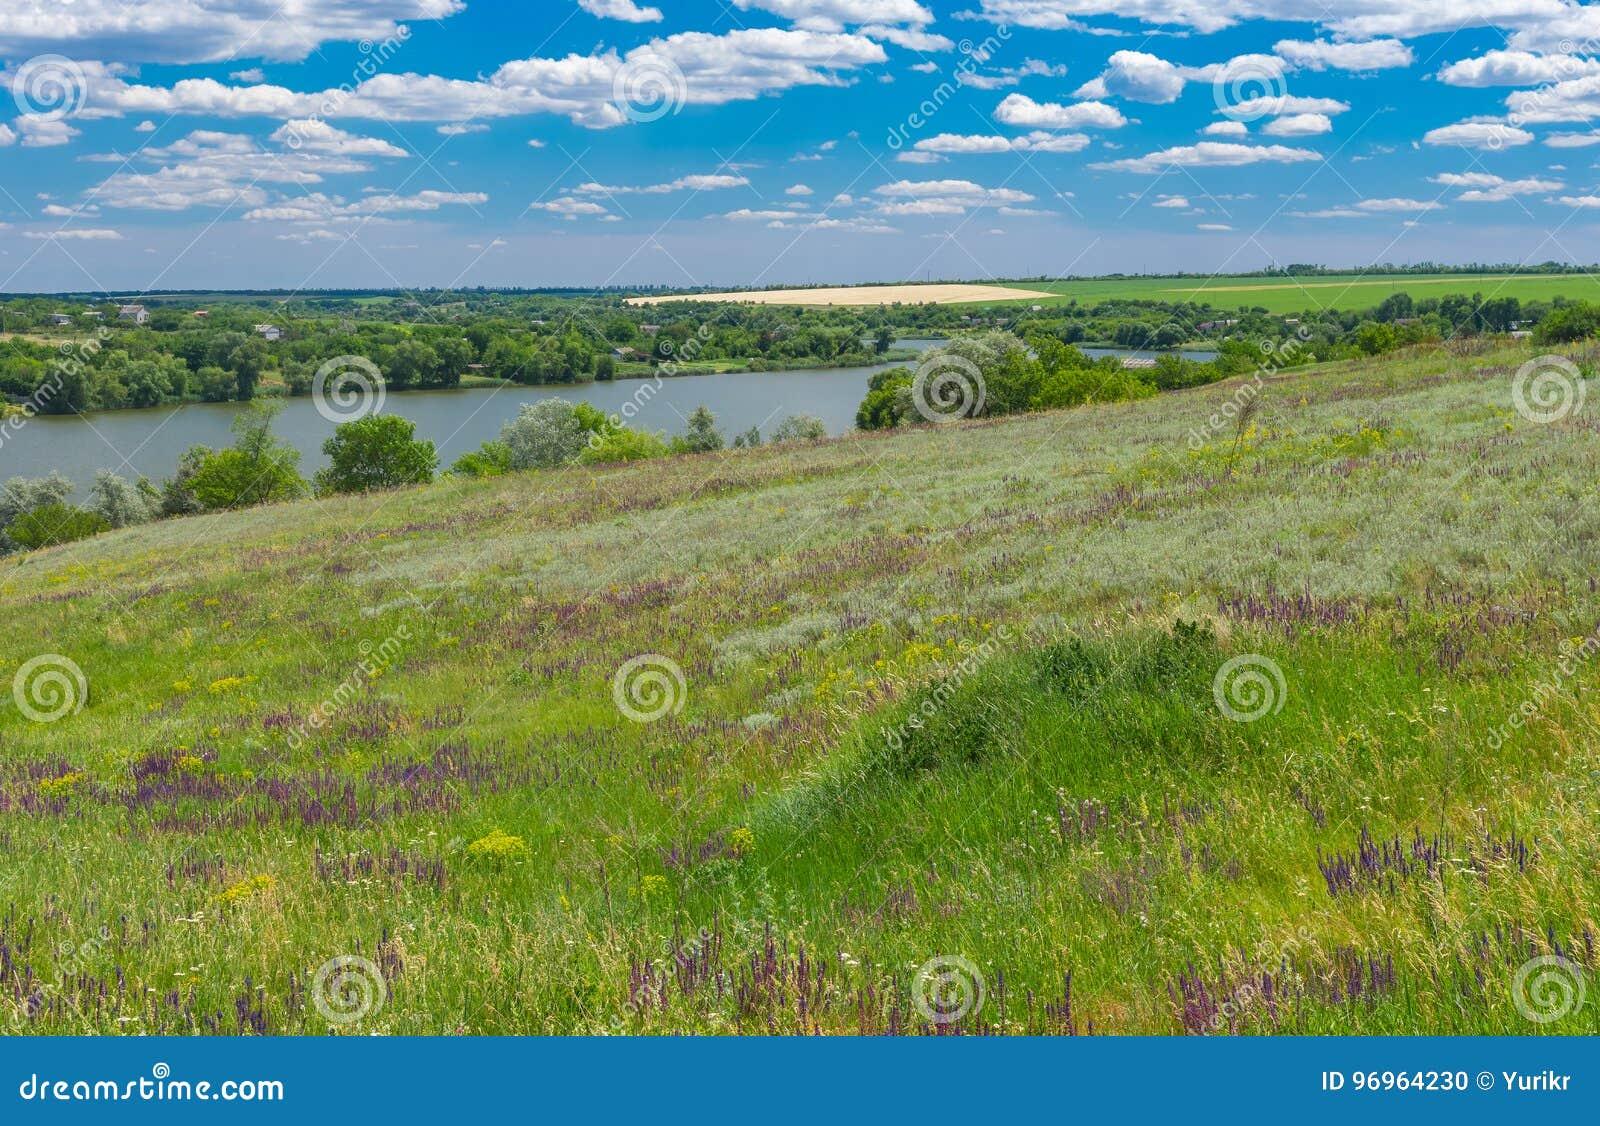 Landscape with Suha Sura river in Vasylivka village near Dnepr city, central Ukraine